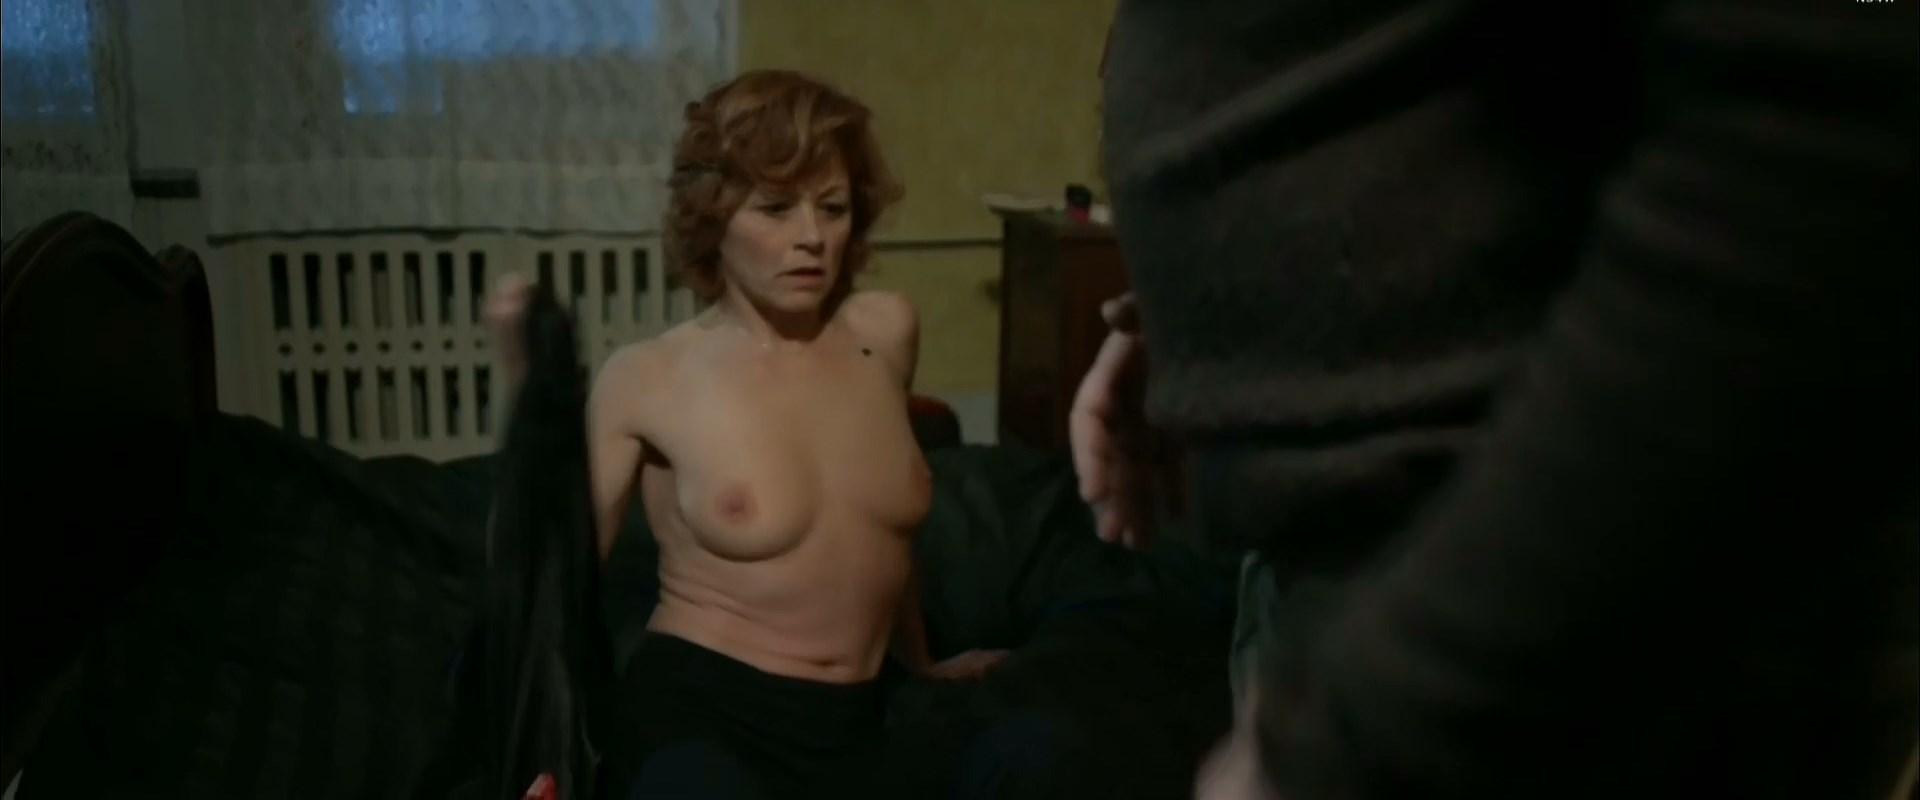 Jennifer nackt Stock 12 Times